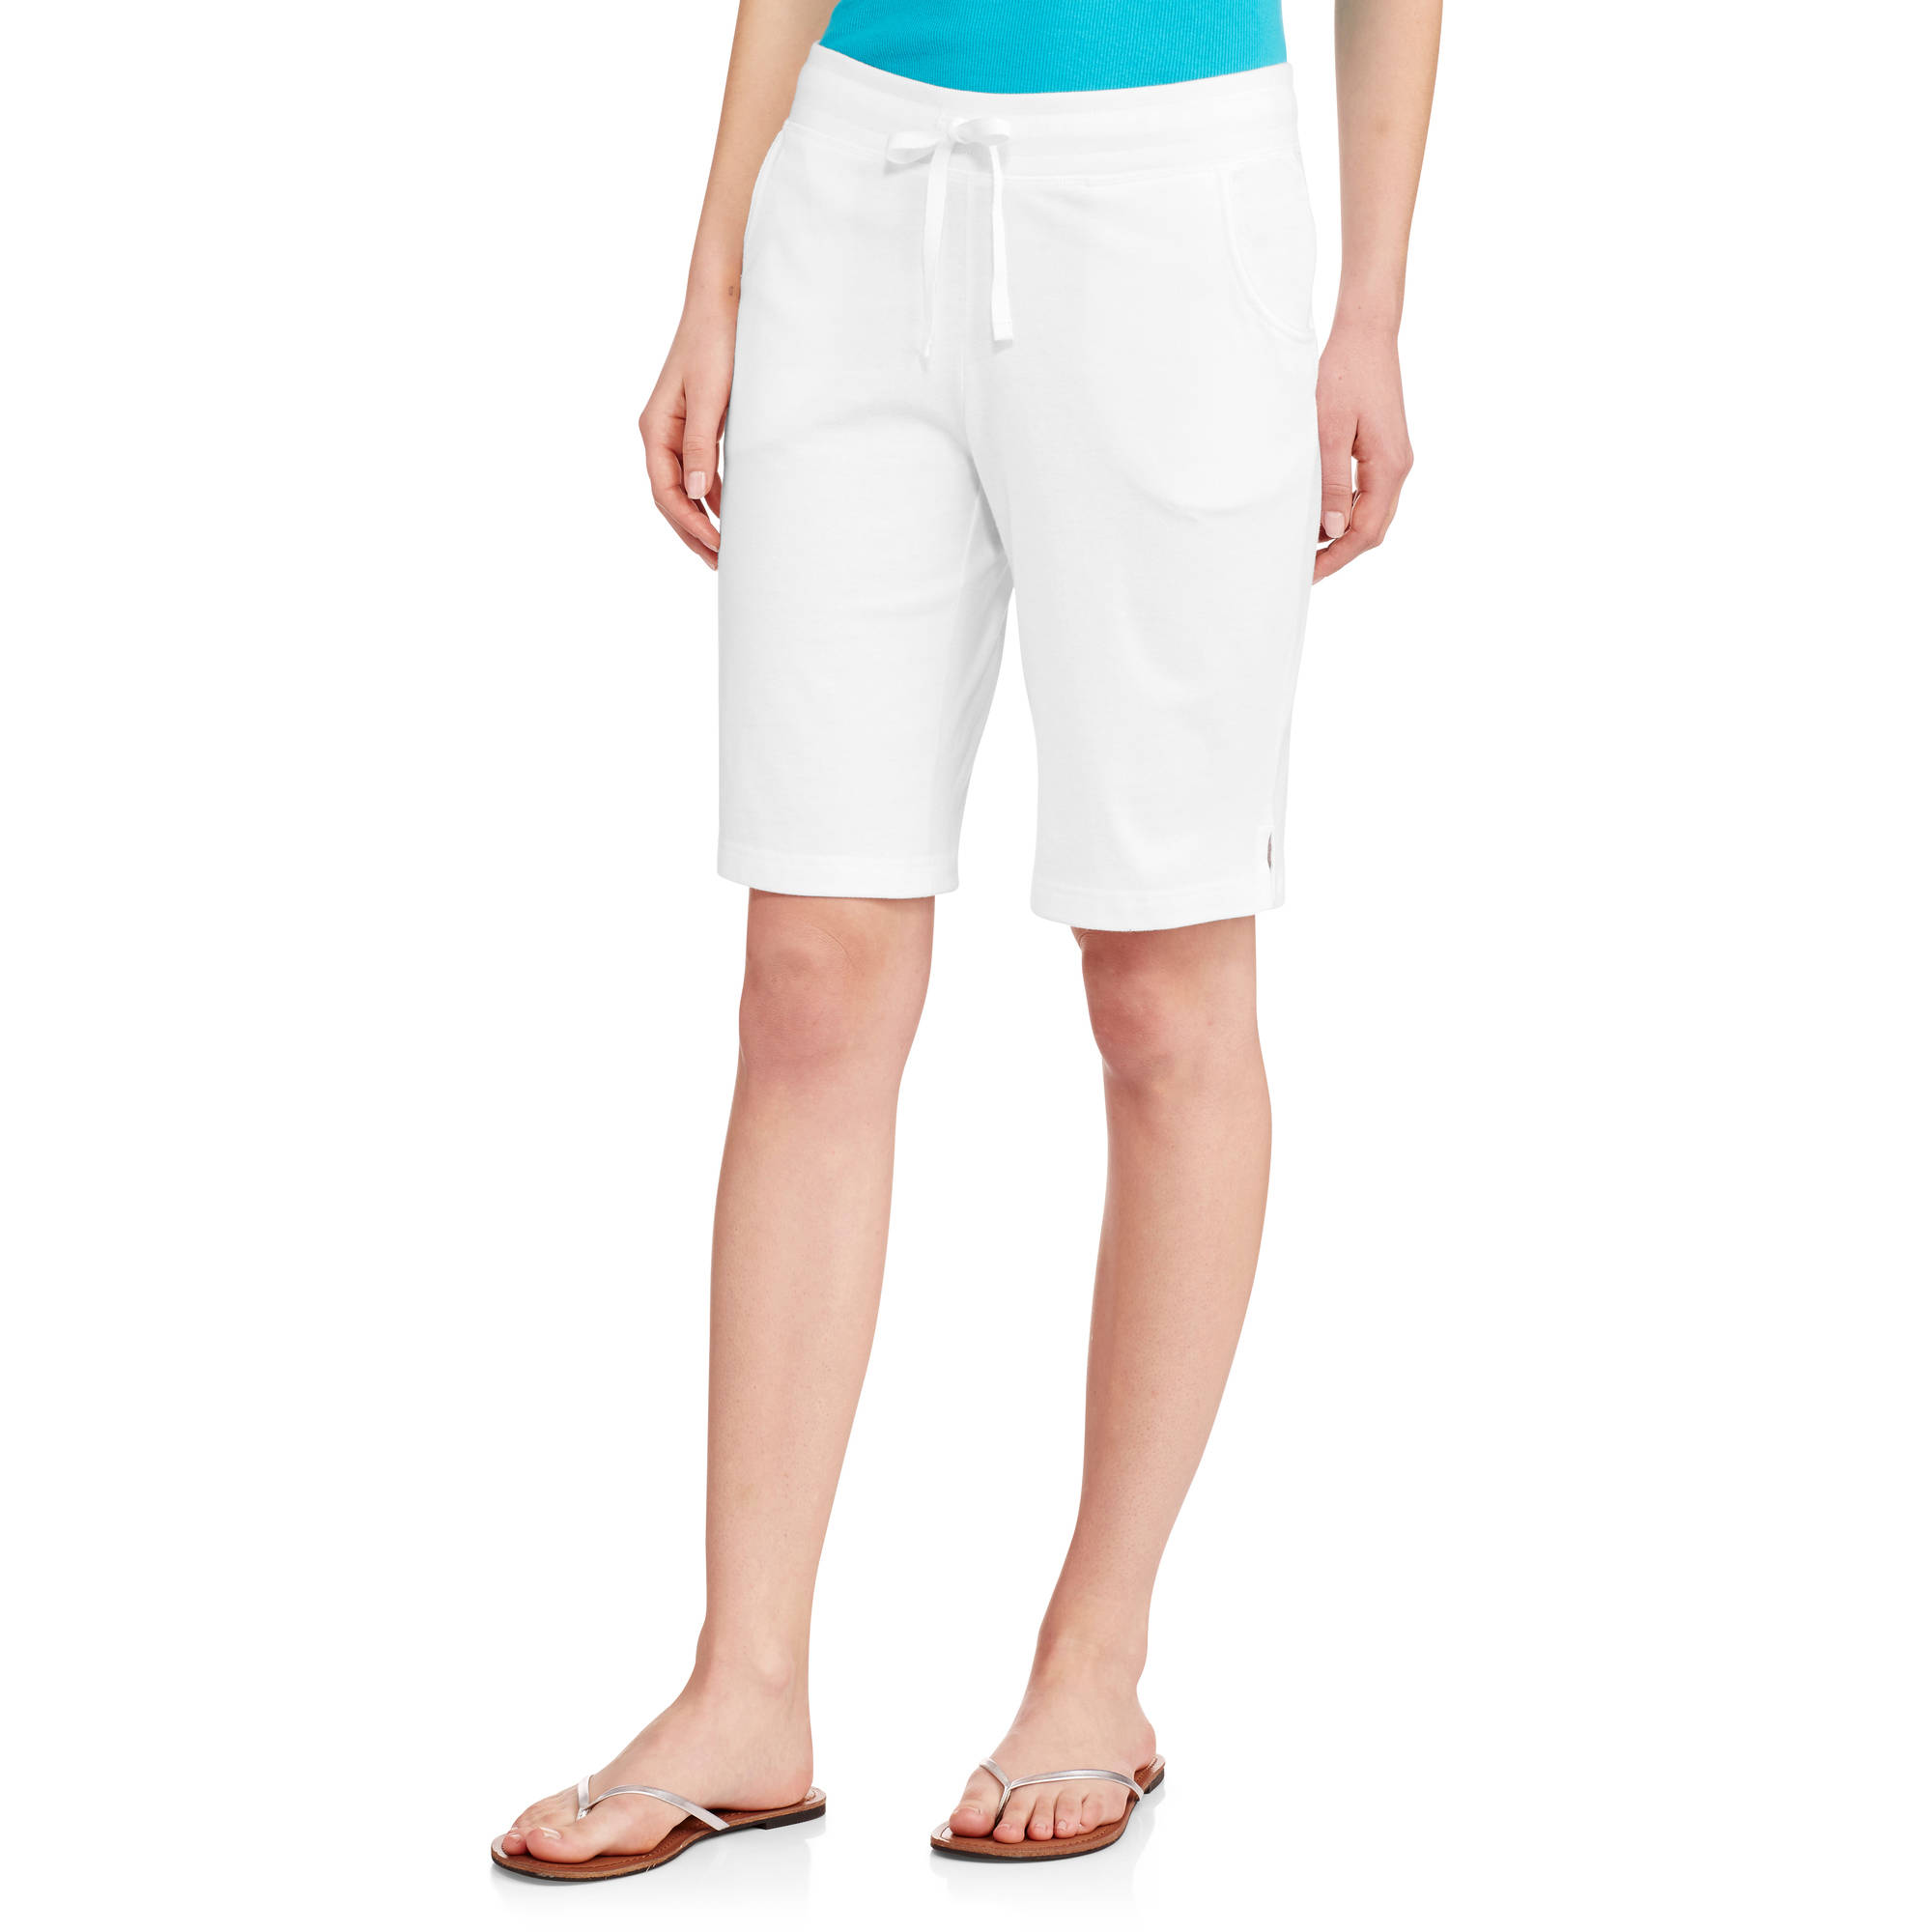 White Stag Women's Knit Shorts